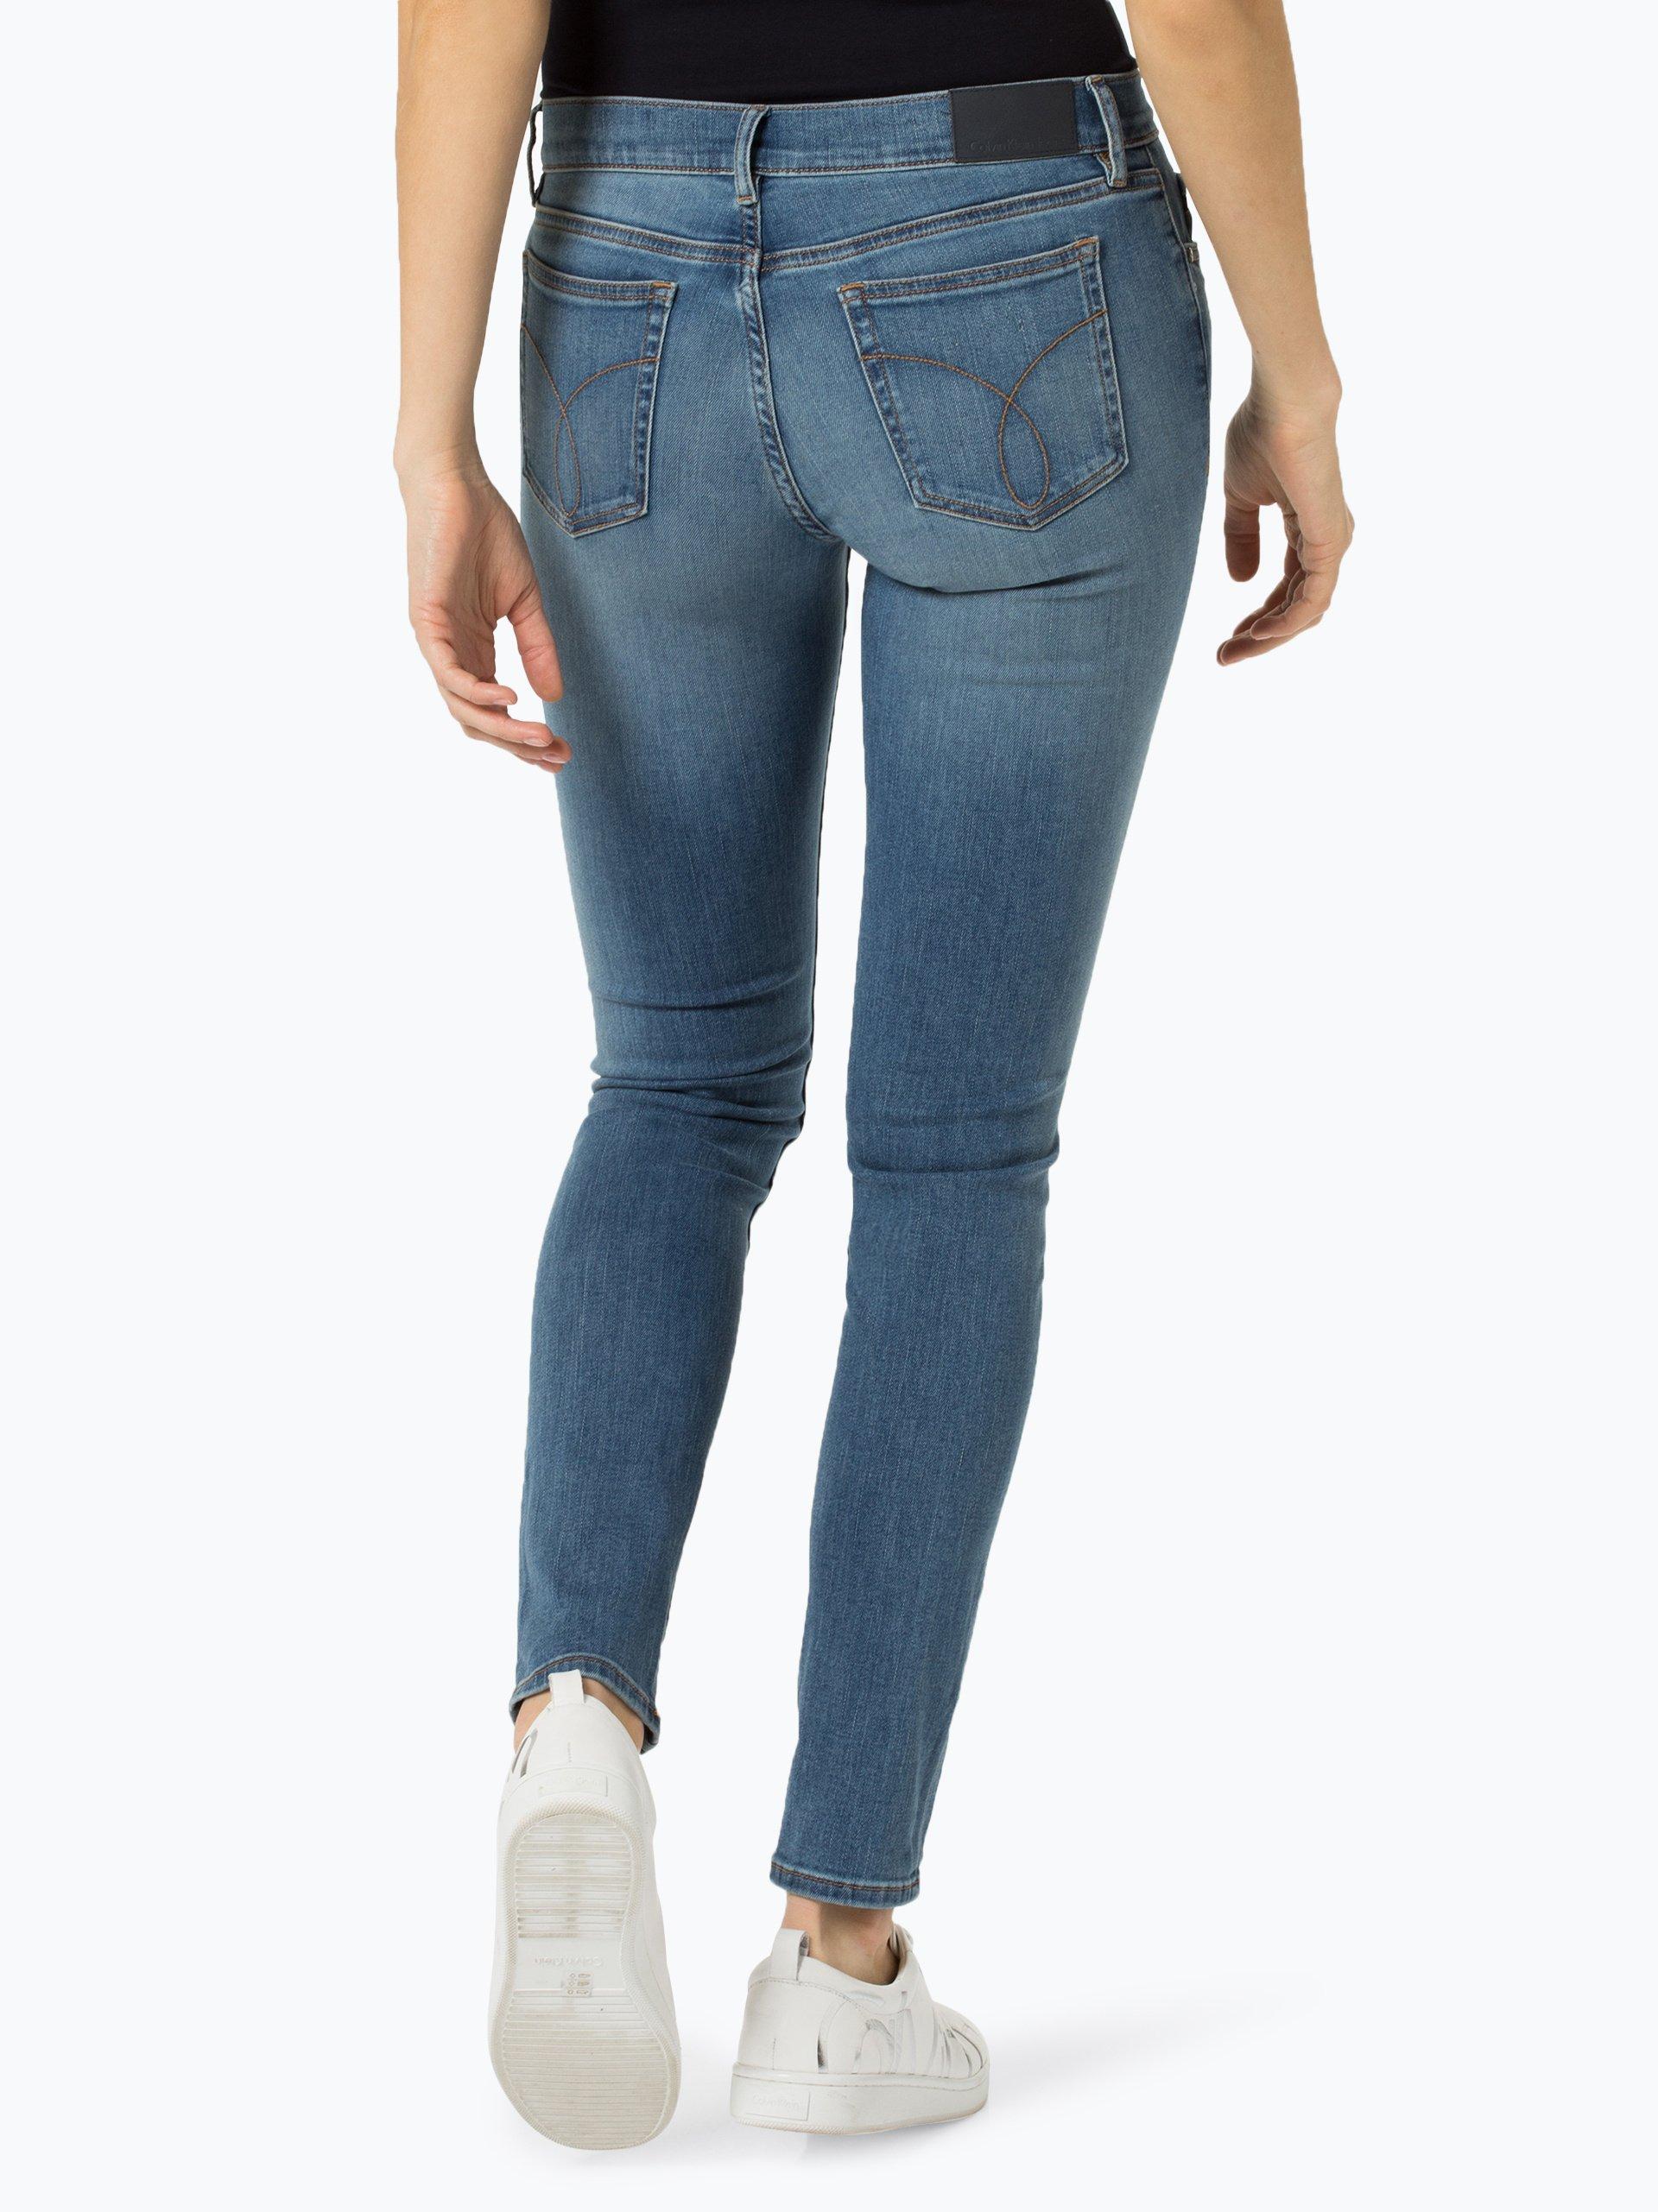 calvin klein jeans damen jeans blau uni online kaufen. Black Bedroom Furniture Sets. Home Design Ideas